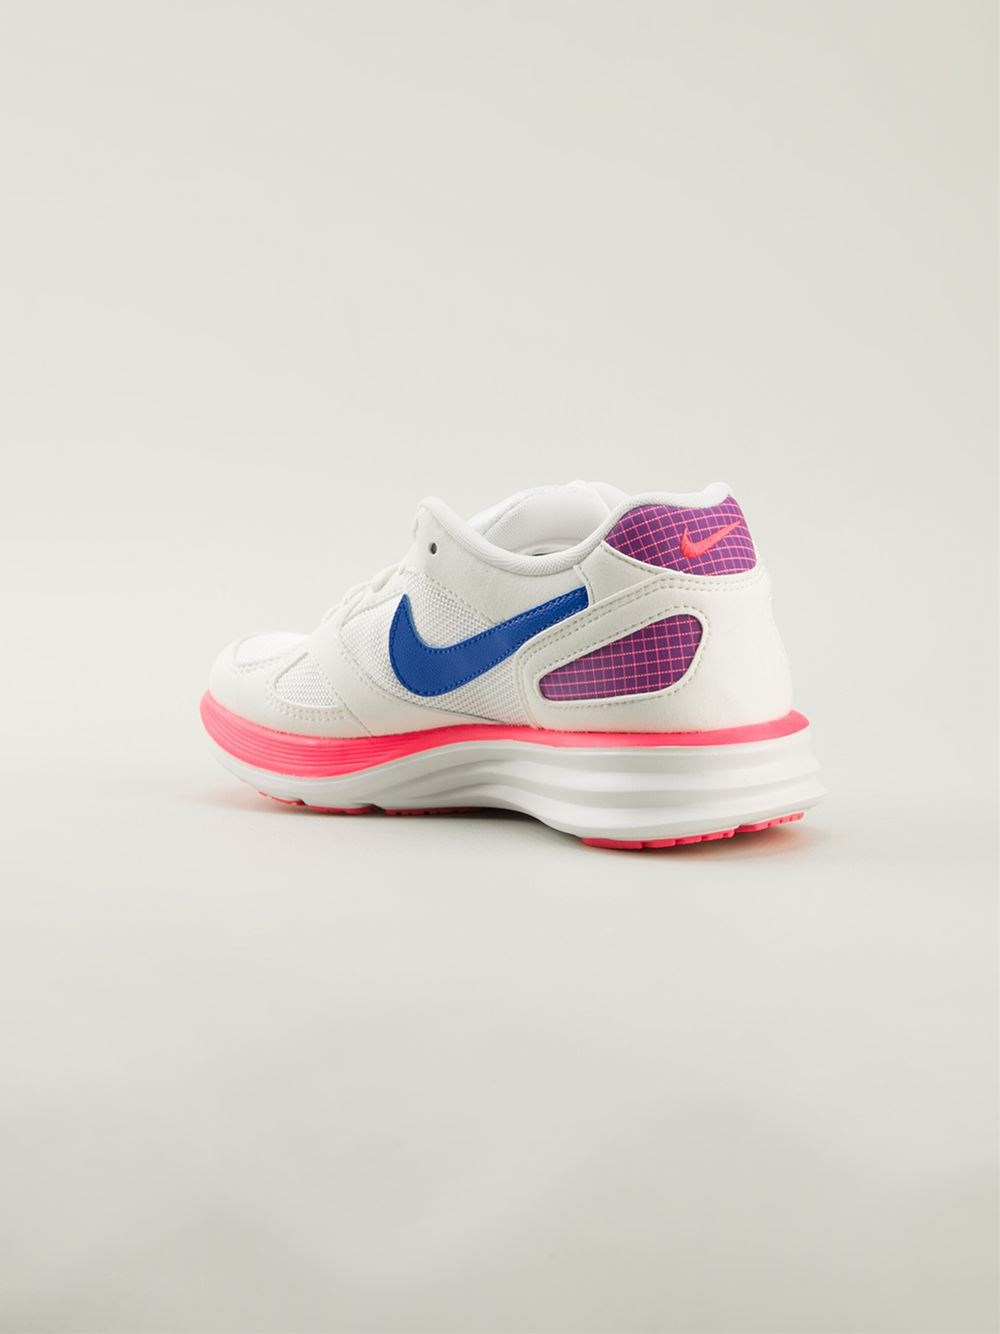 Nike In Lyst Lunarspeed Mariah' 'wmns Sneakers White 1xCqfaw